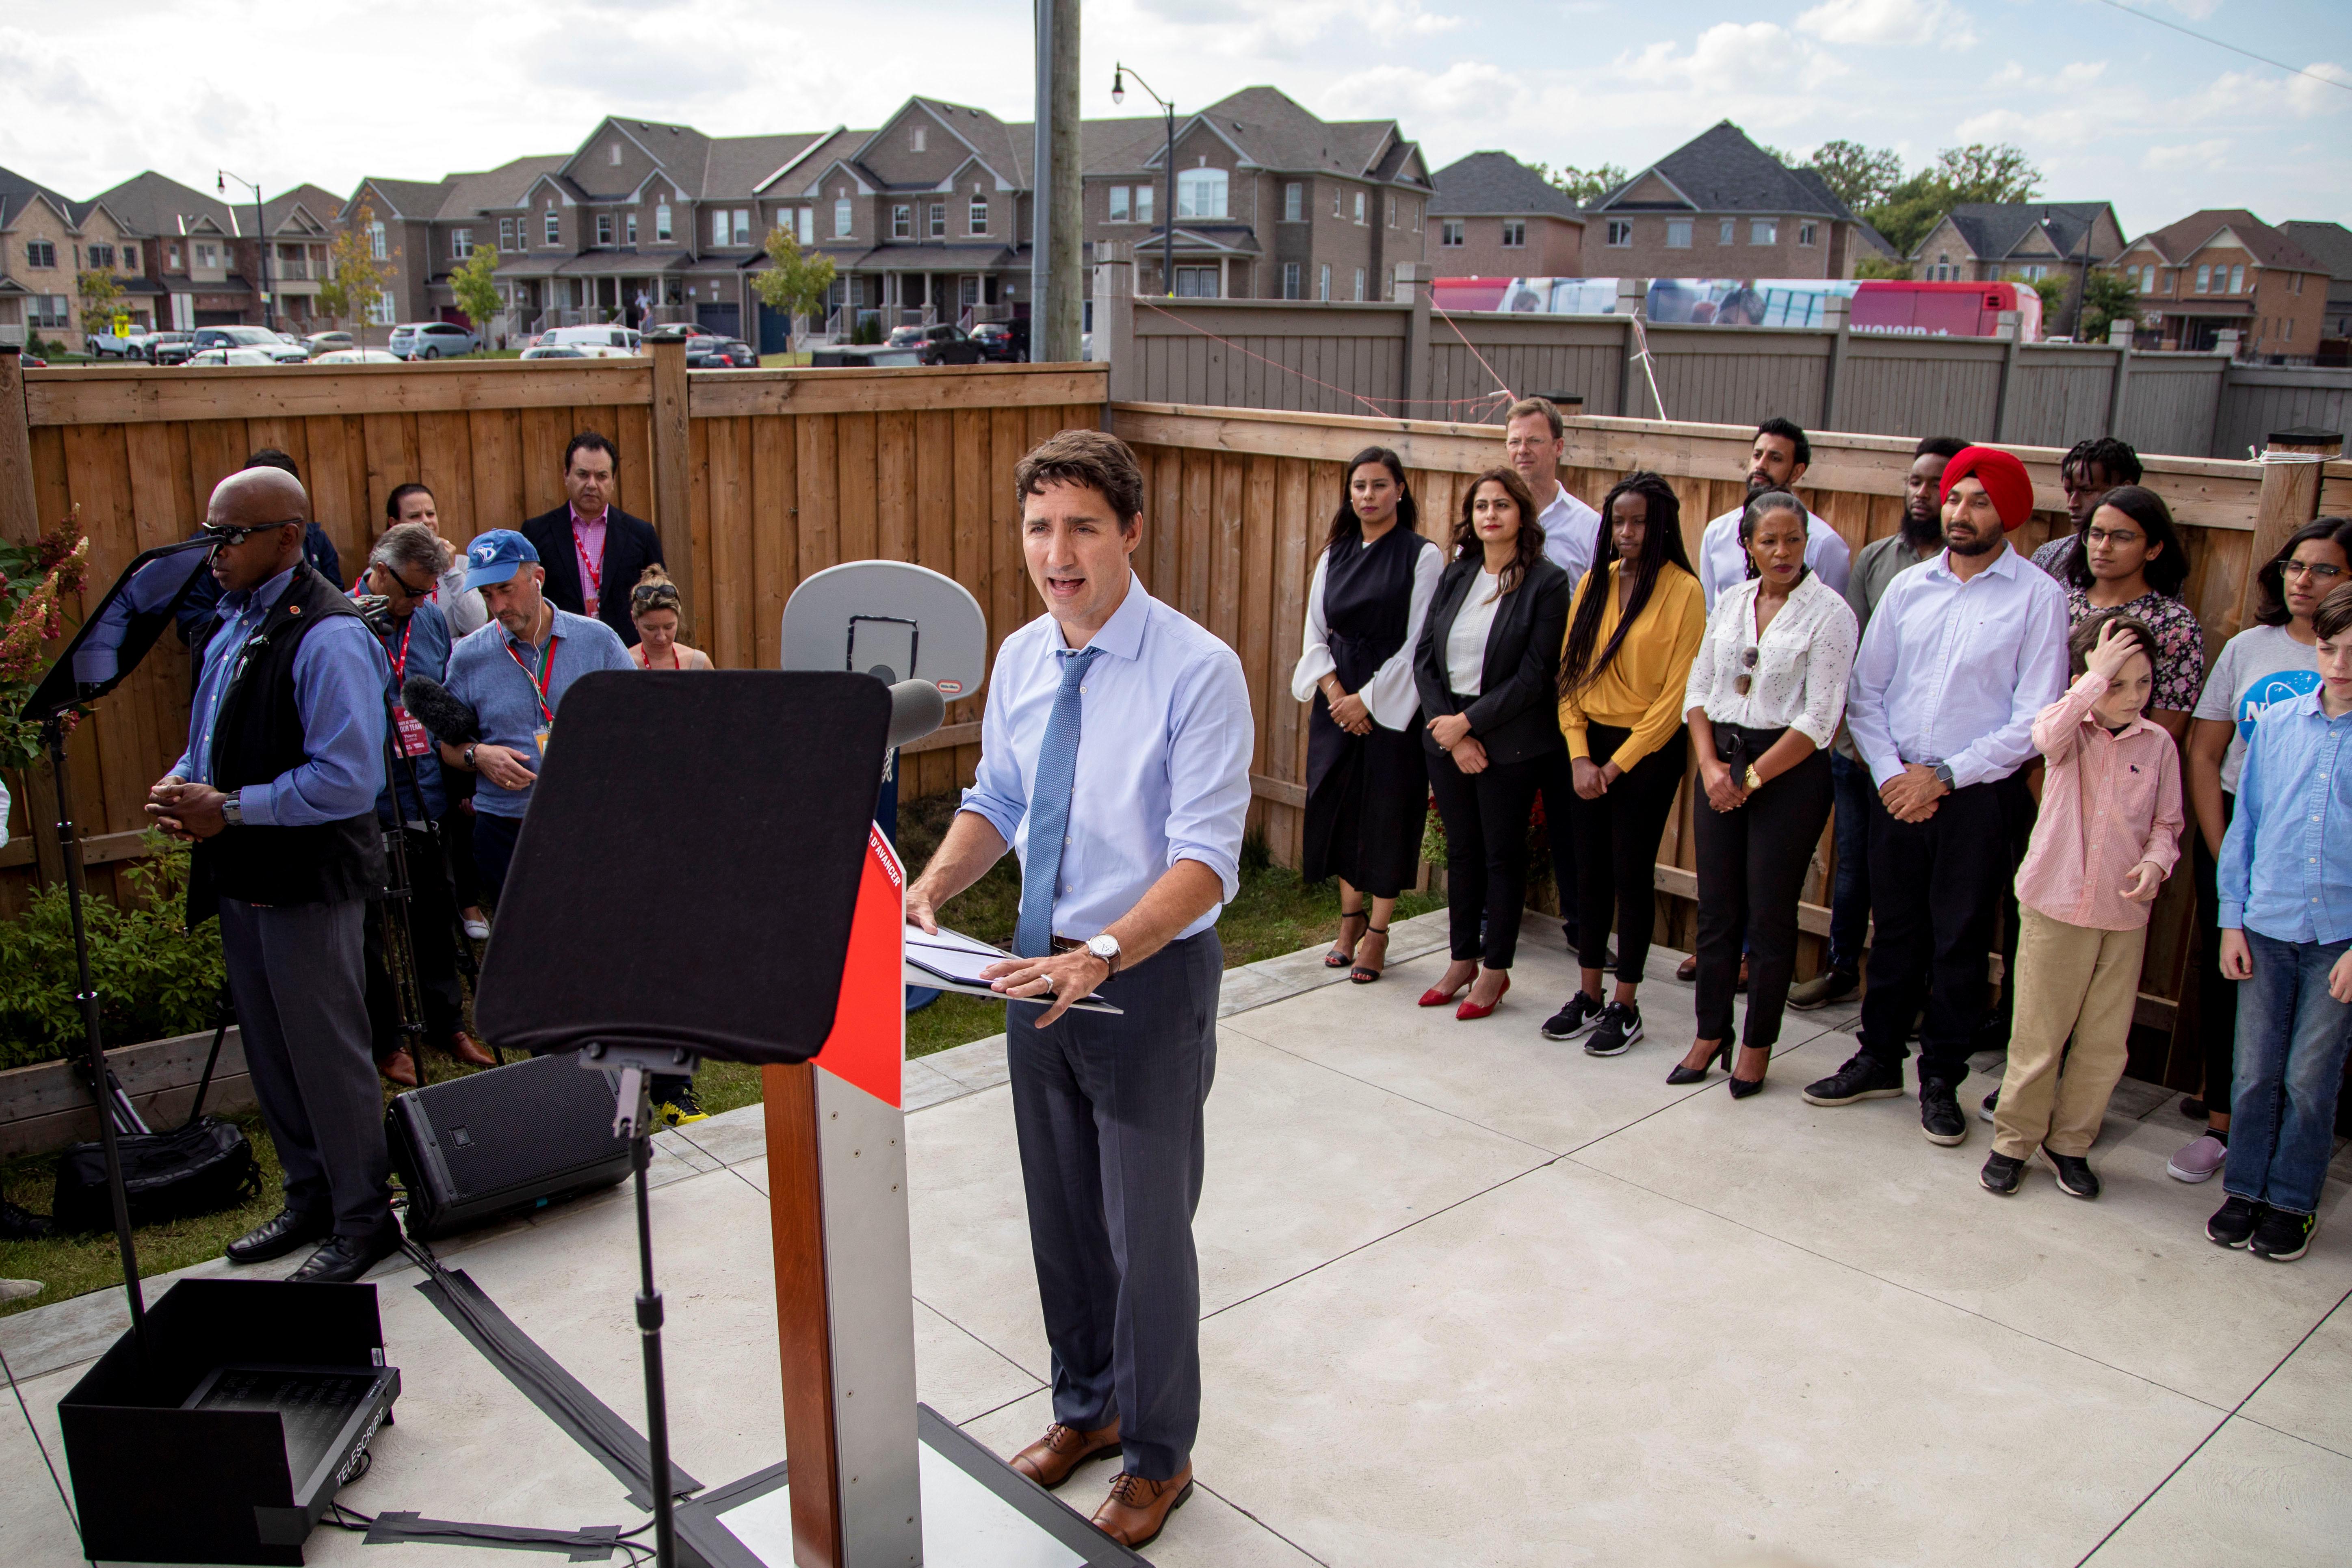 Weird jokes, objectionable attire trip up Canada's Trudeau again